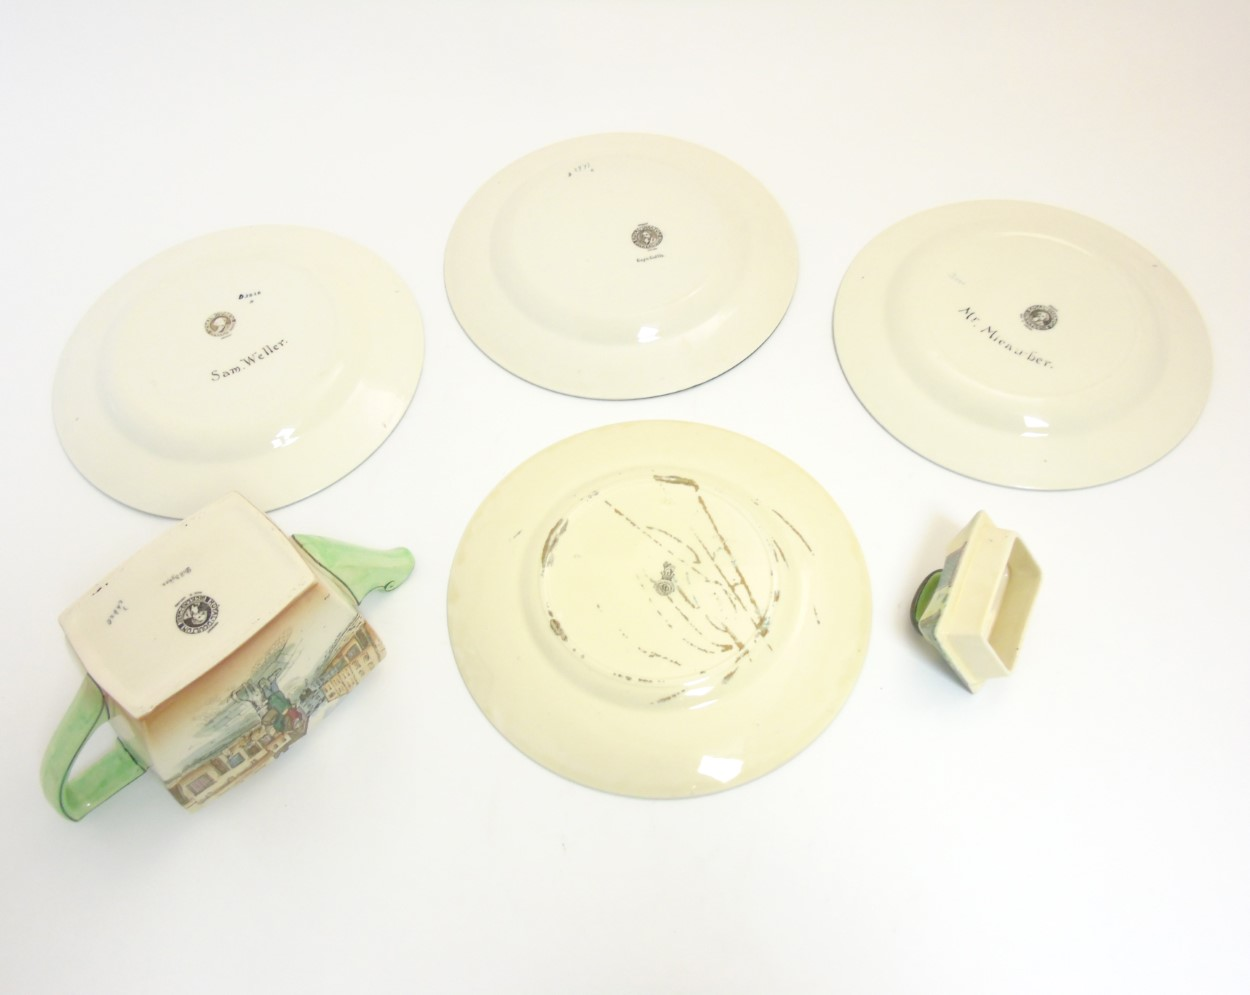 Lot 71 - A quantity of ceramics comprising Royal Doulton Dickensware items comprising a Bill Sykes teapot,